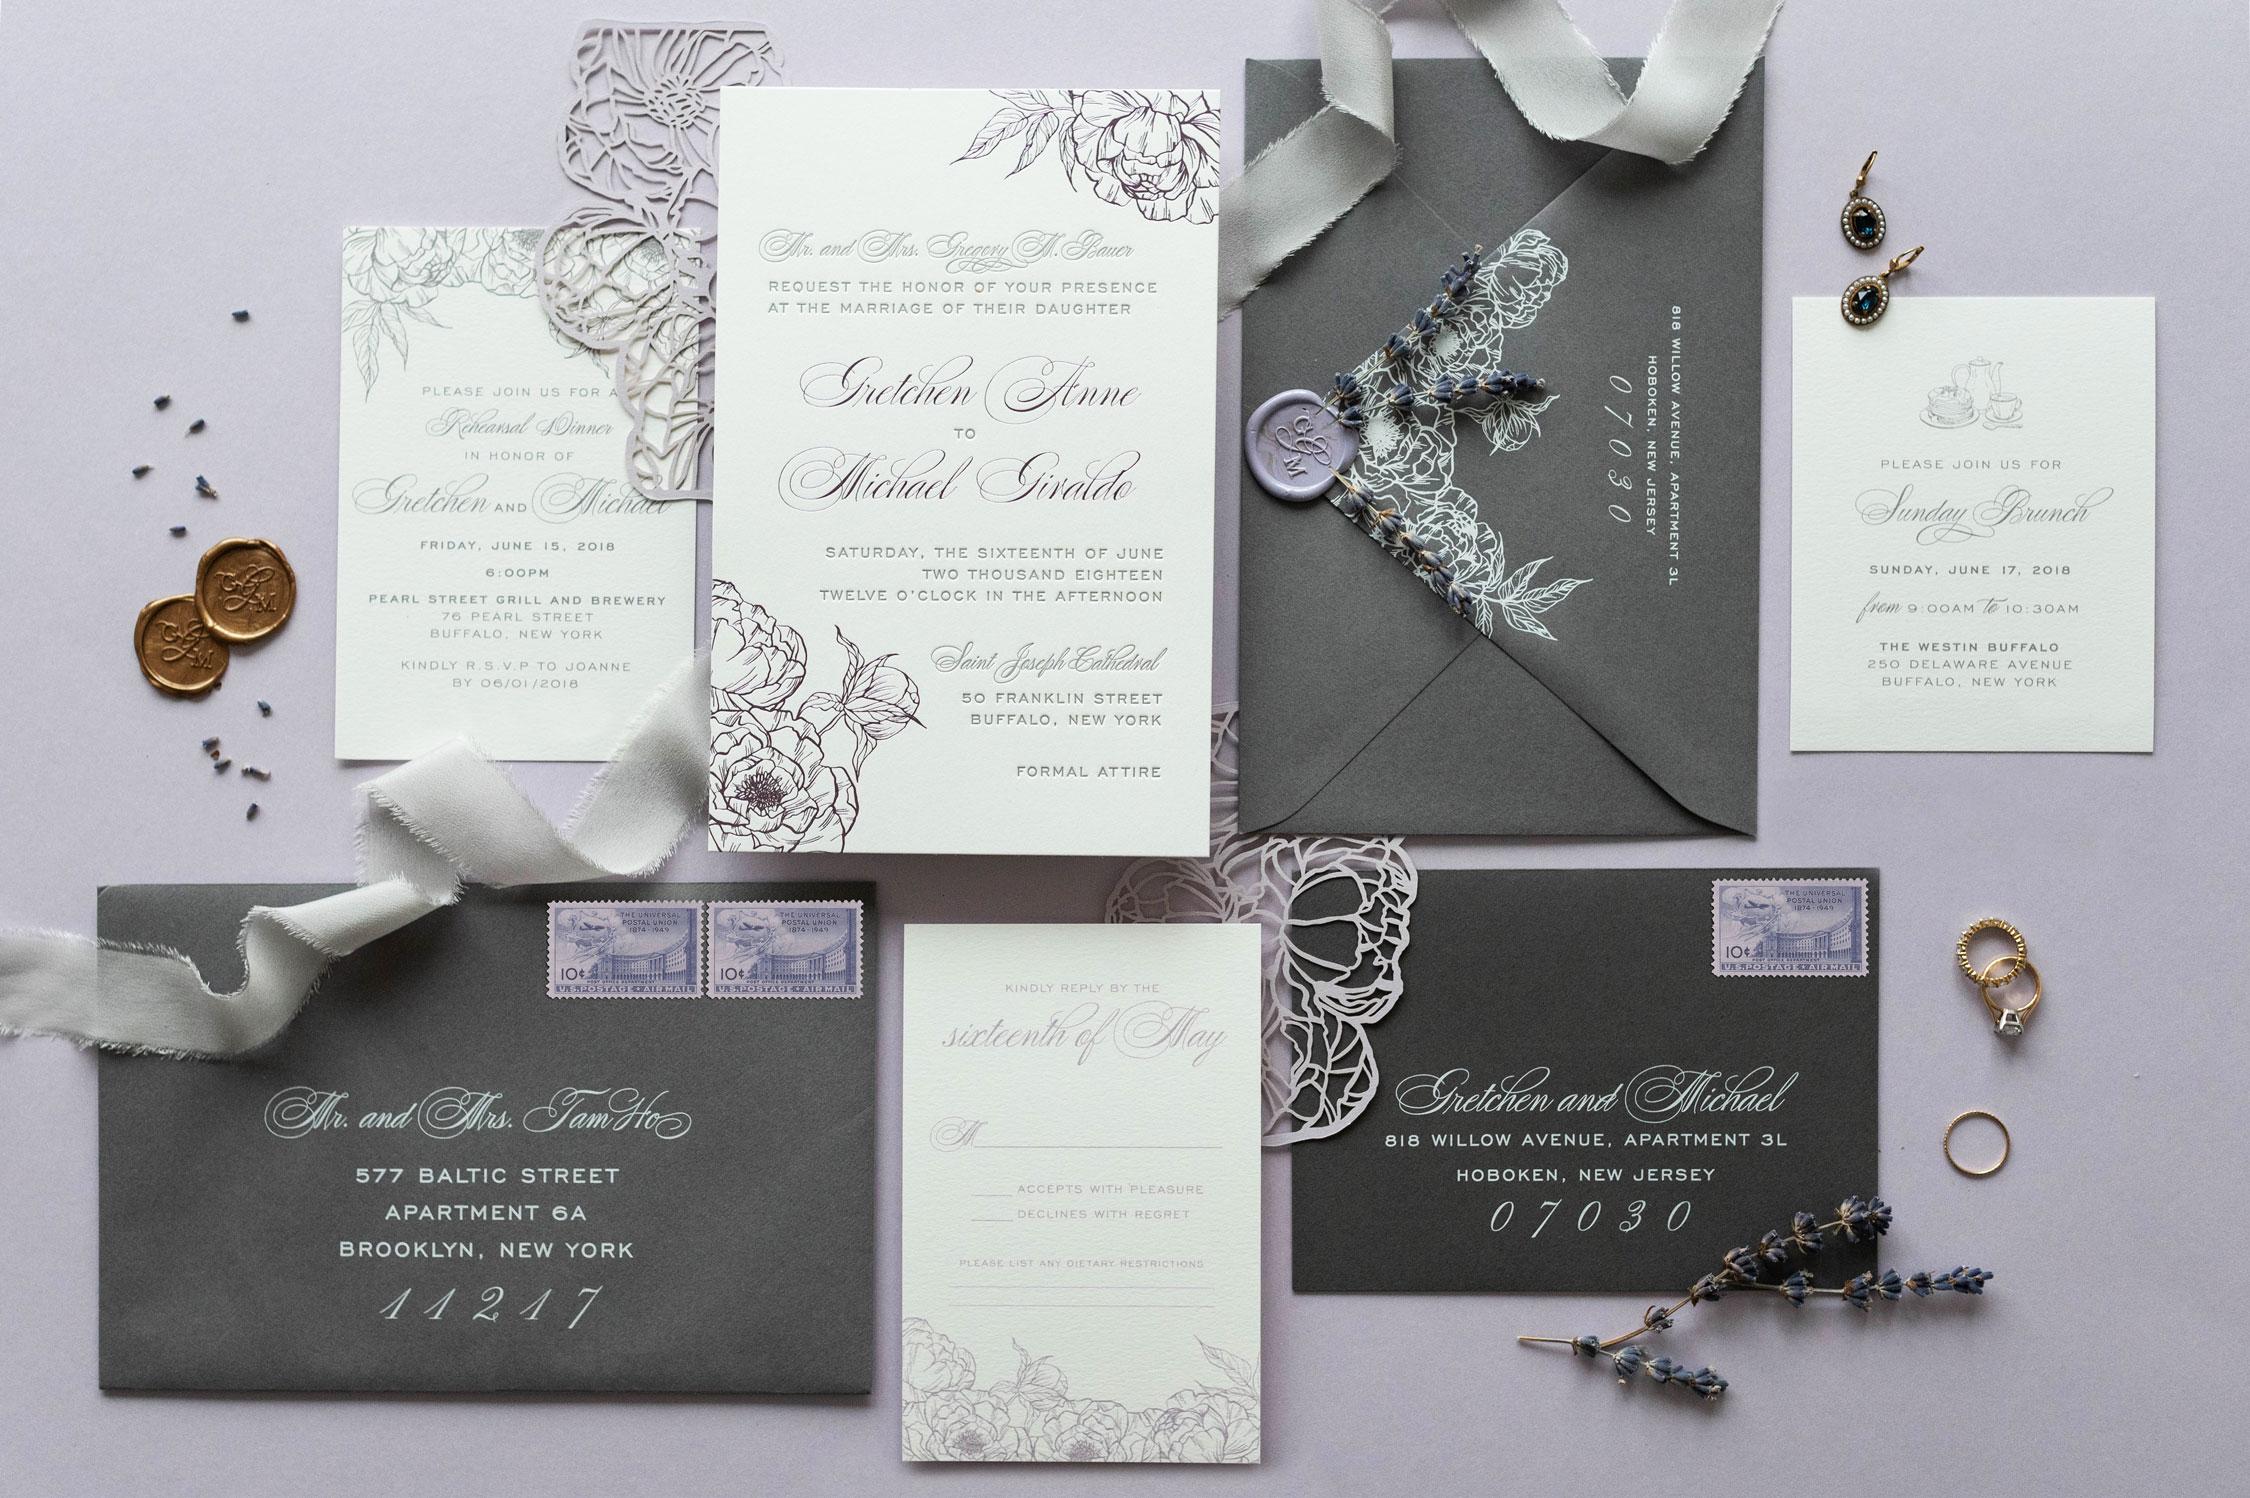 Vidhi_dattani_laser_cut_foil_letterpress_invitation_suite_purple_lavender.jpg